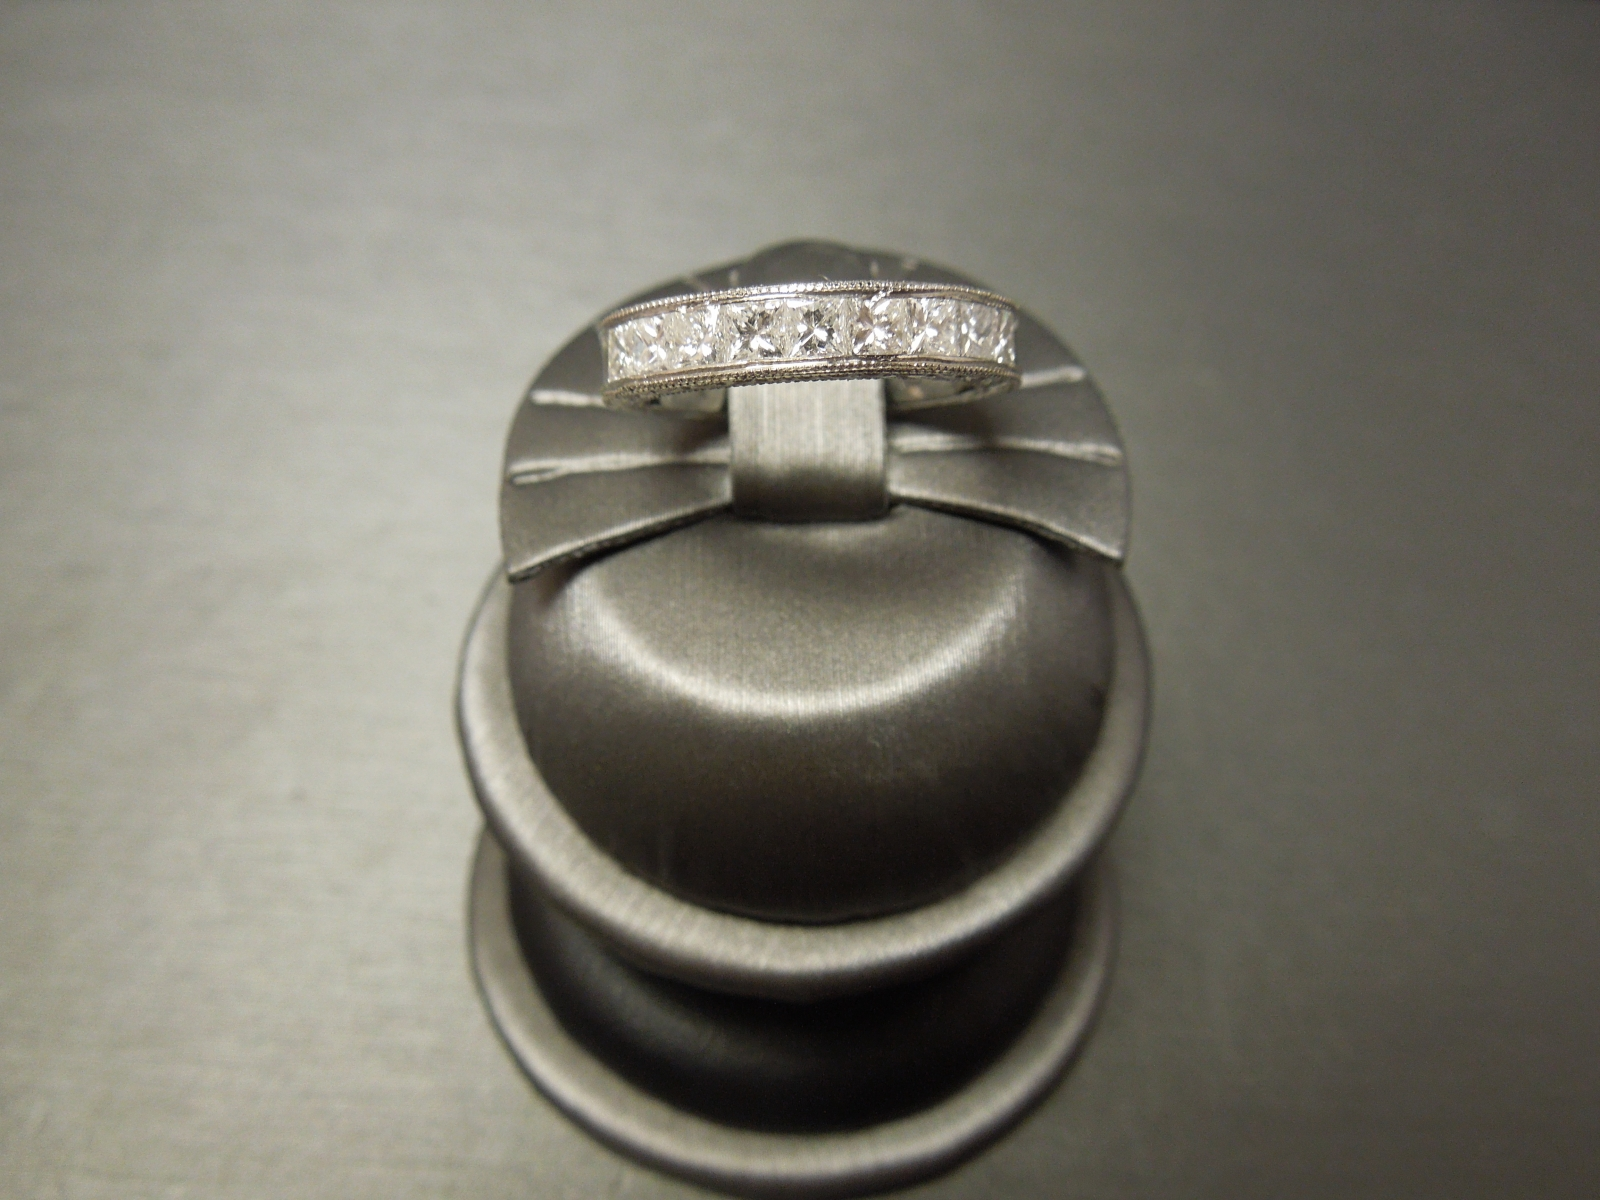 Art Deco Platinum Wedding Band 125cts Diamond Engraved